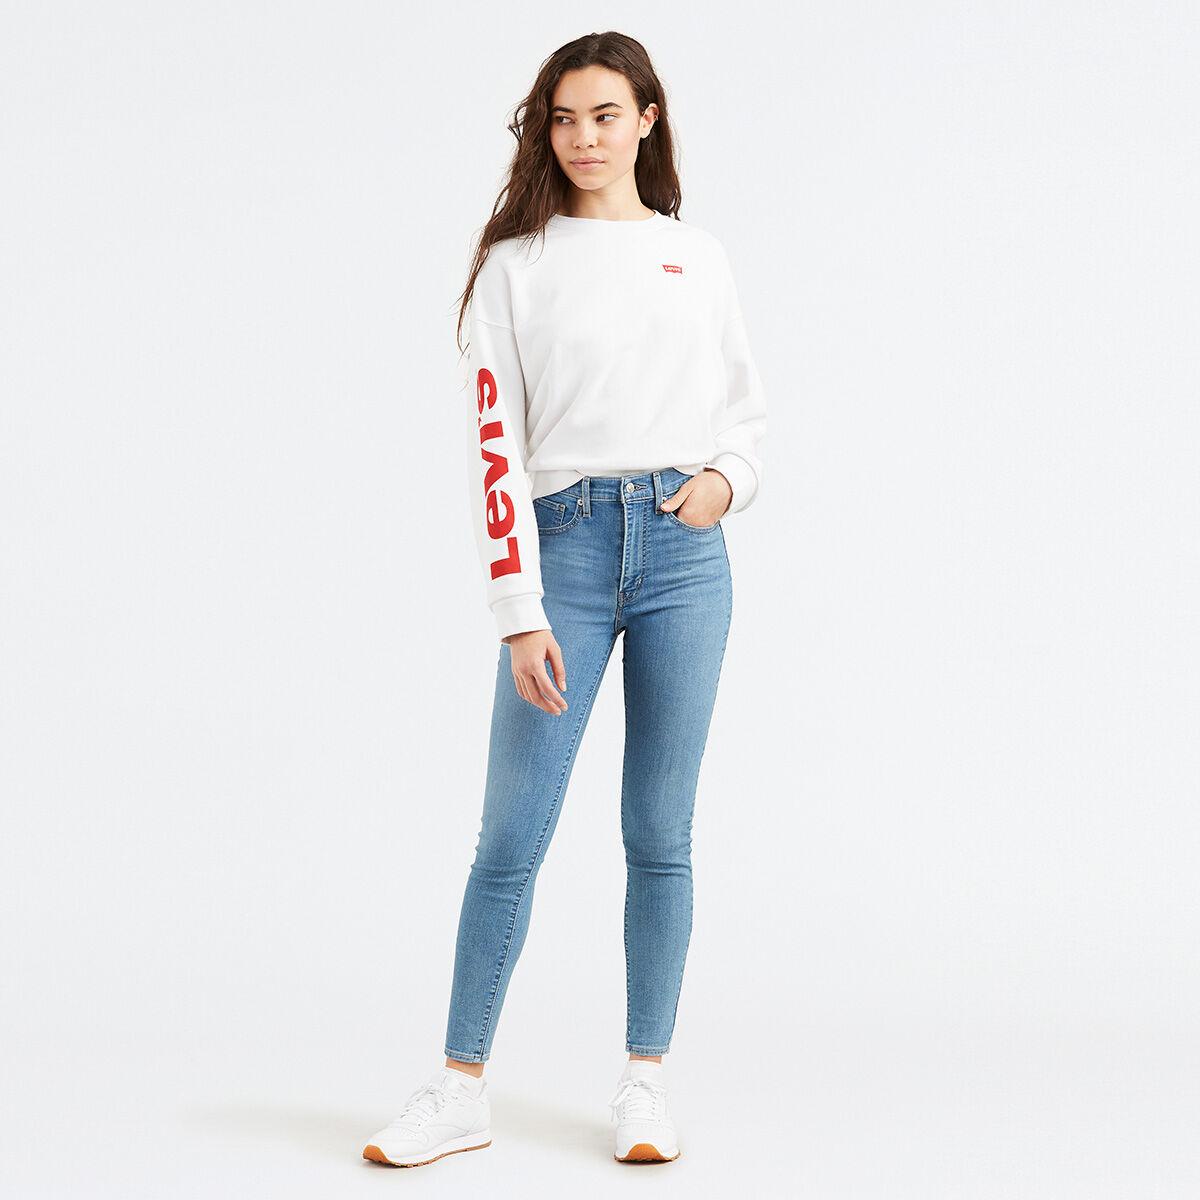 Levi's Skinny Jeans Mile High Super Skinny